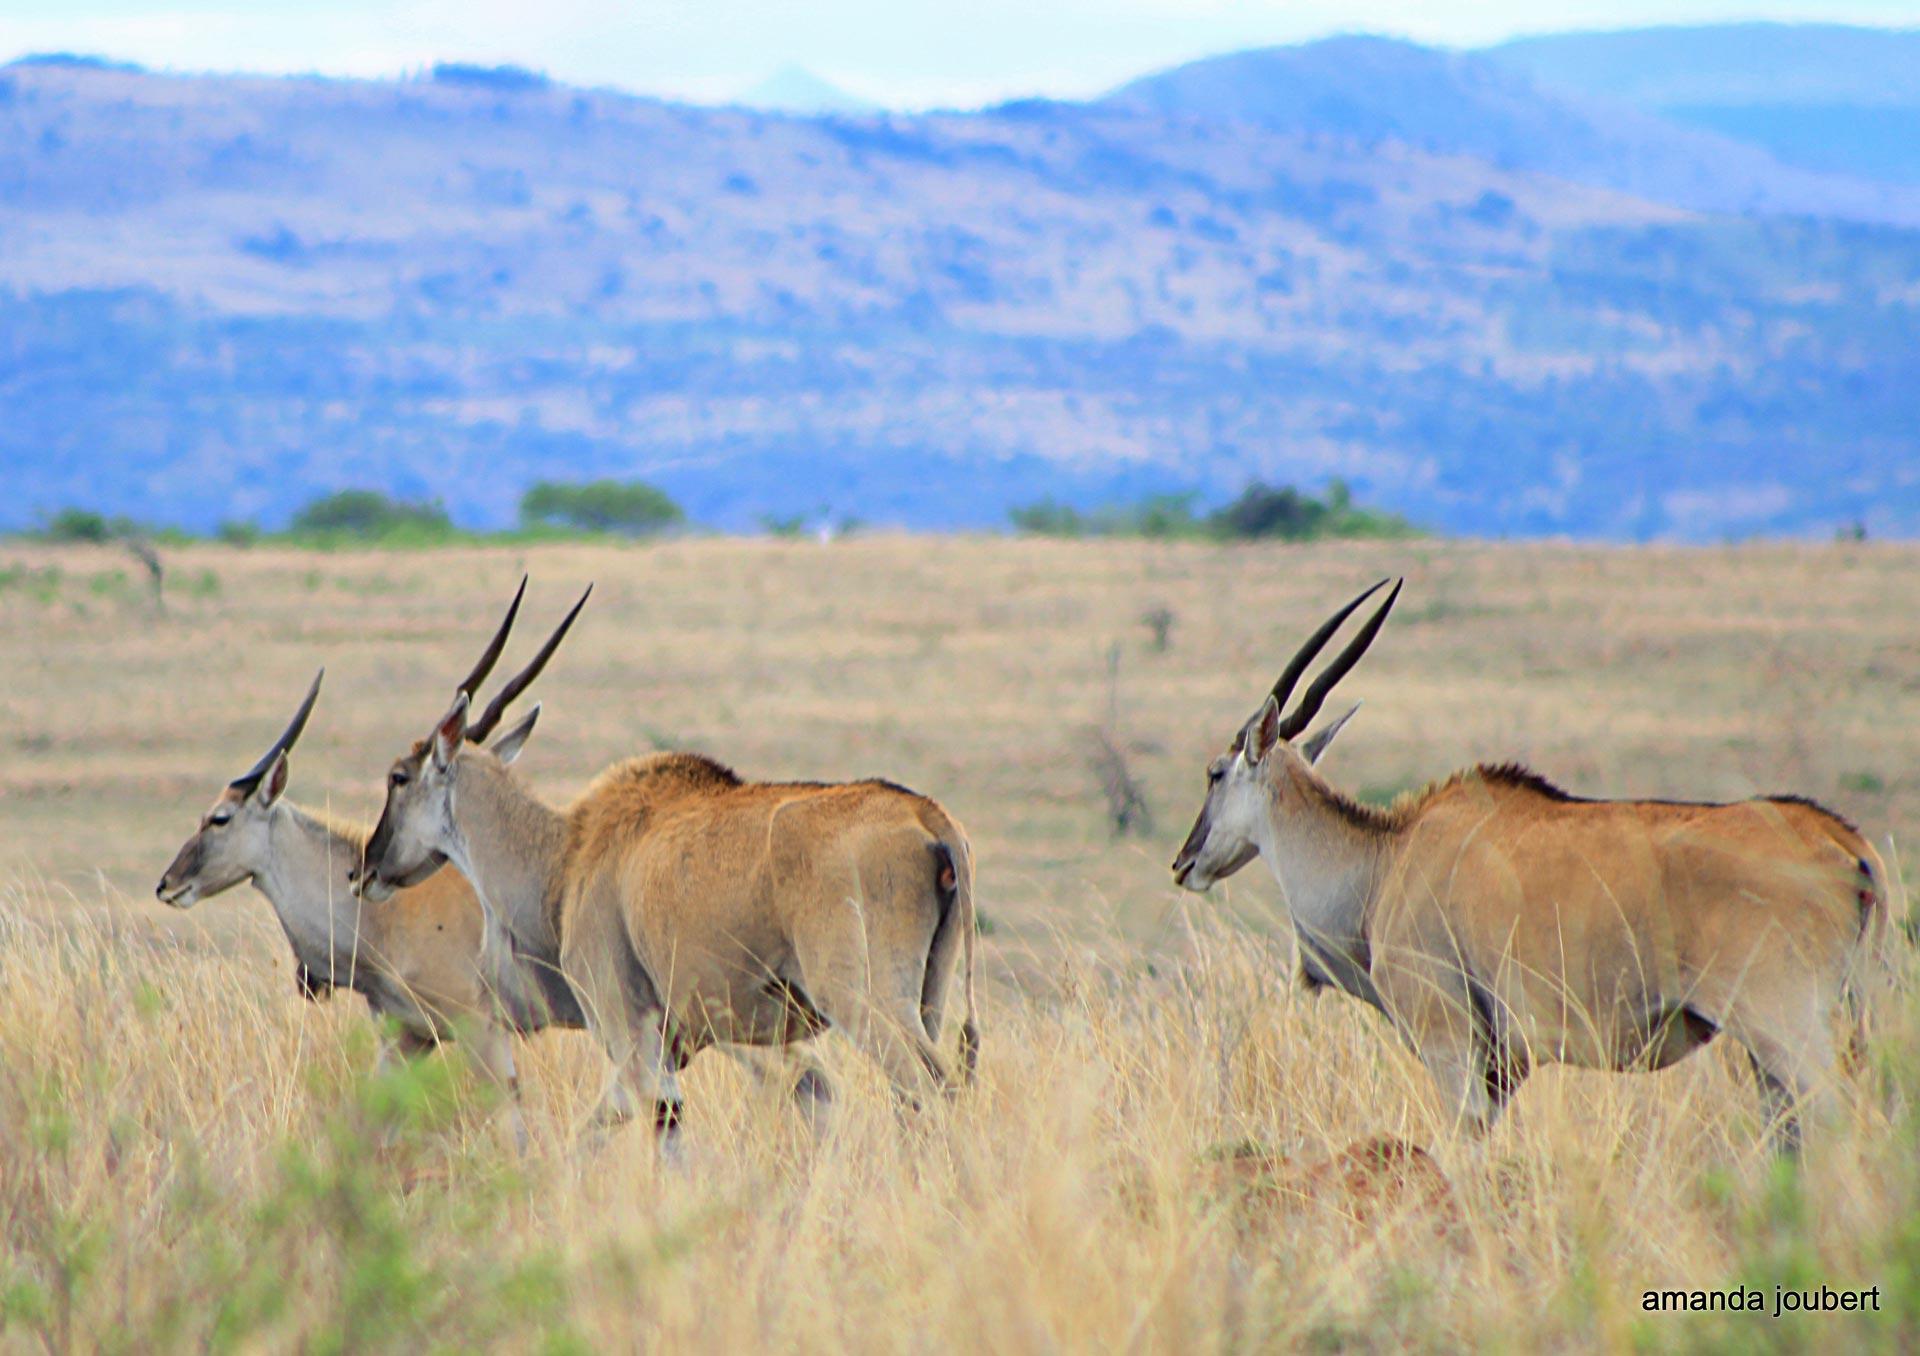 Eland Nambiti Private Game Reserve